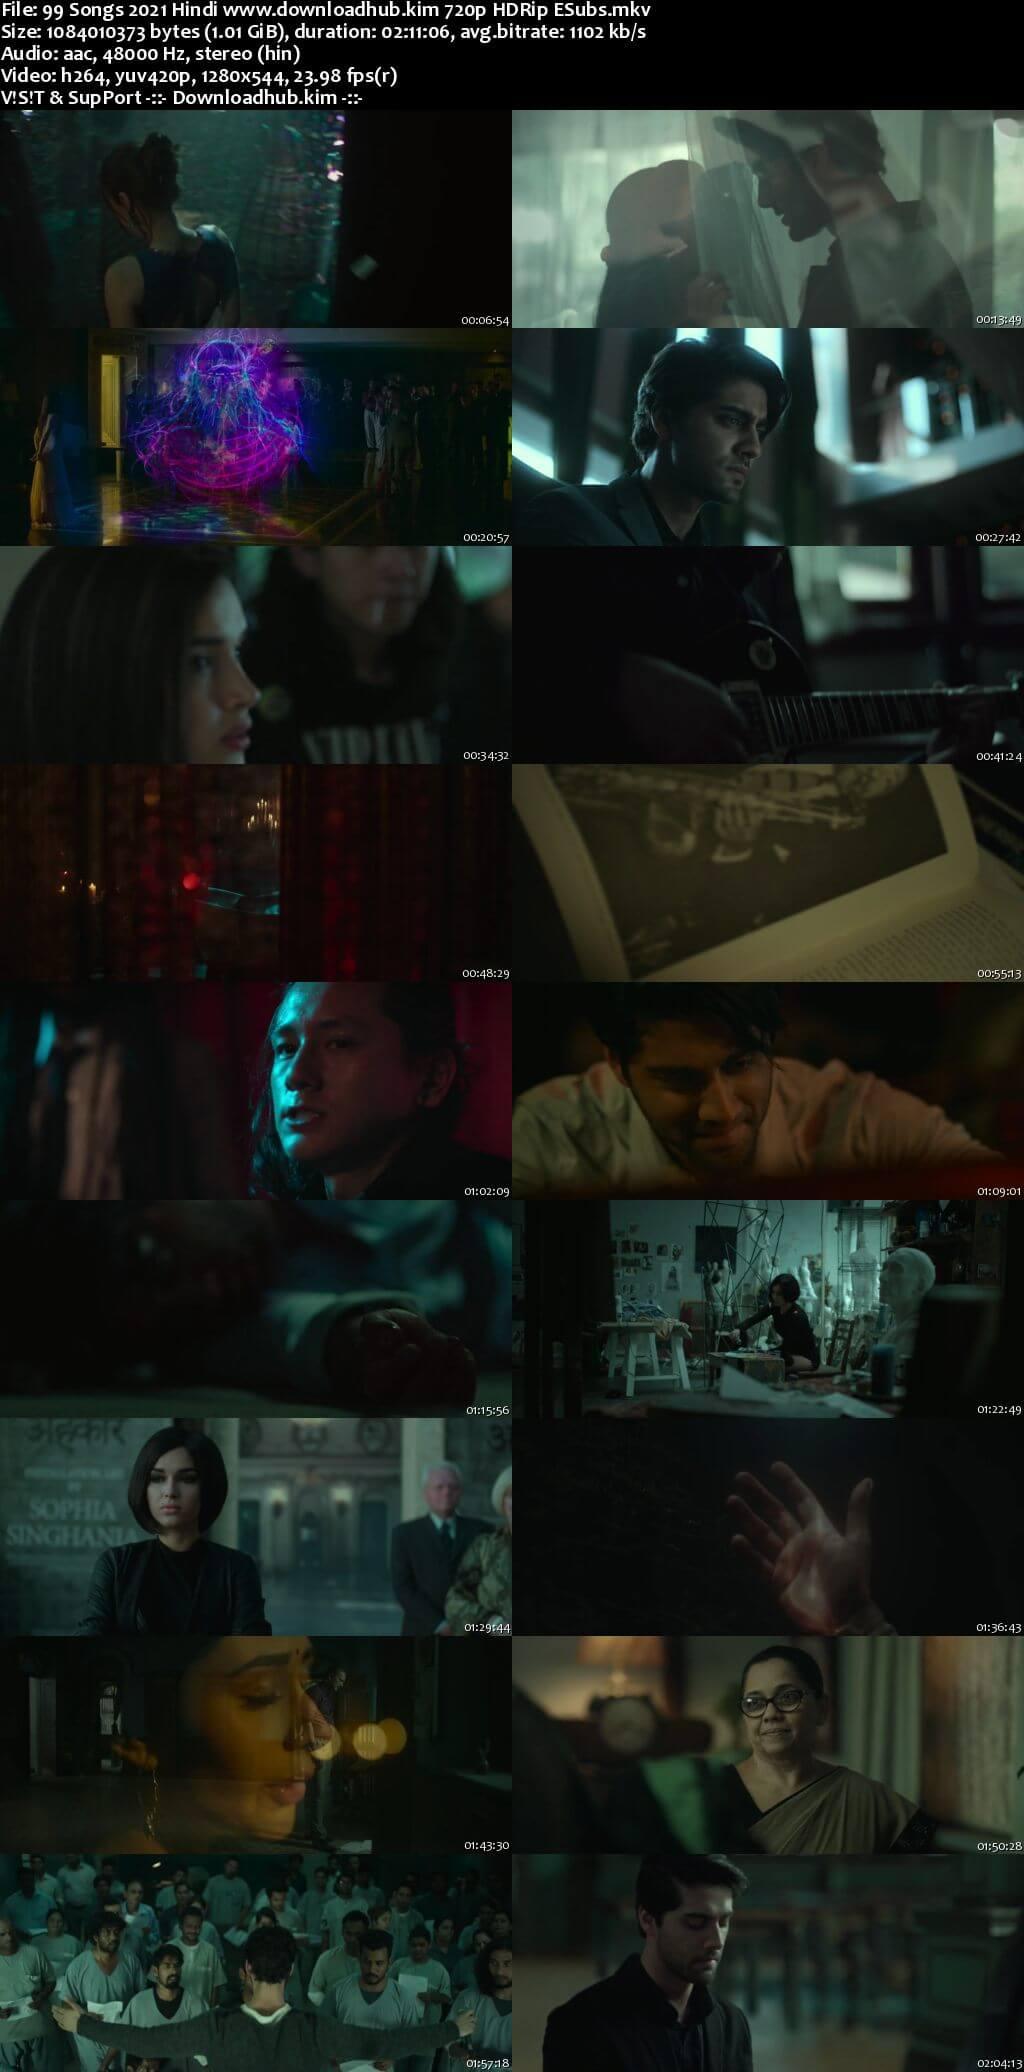 99 Songs 2021 Hindi 720p HDRip ESubs